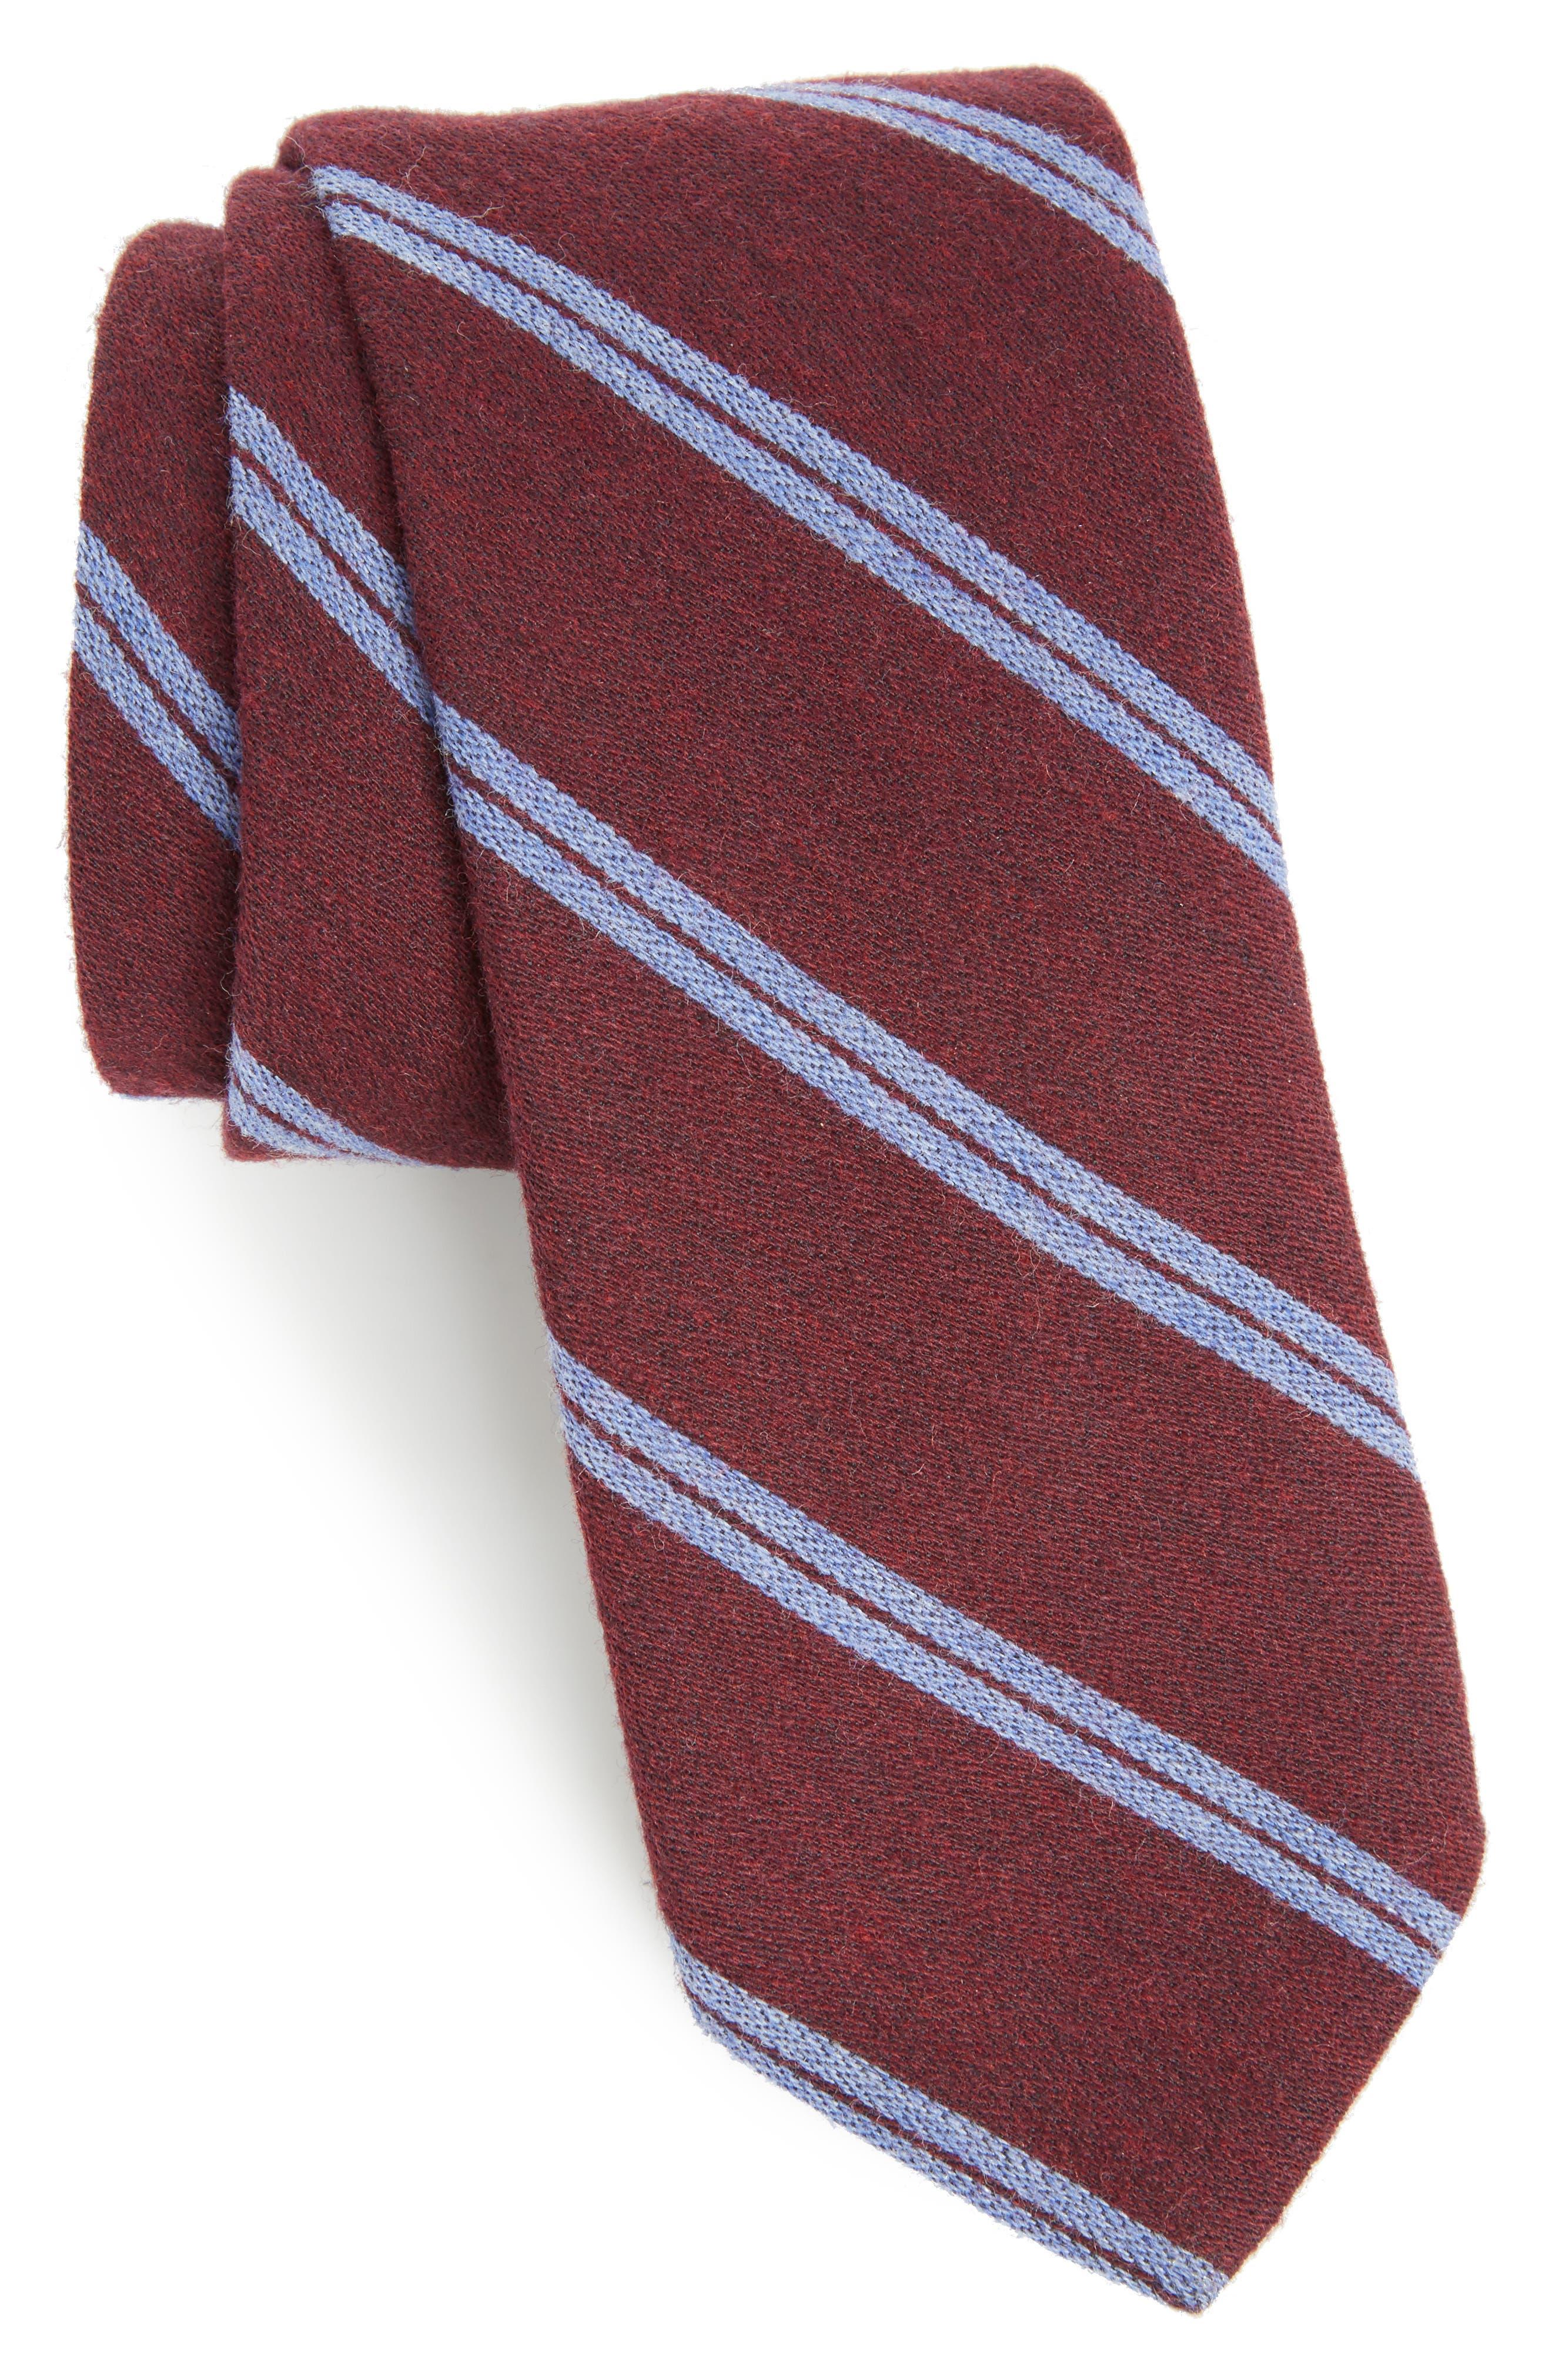 Main Image - Nordstrom Men's Shop Deo Stripe Wool Tie